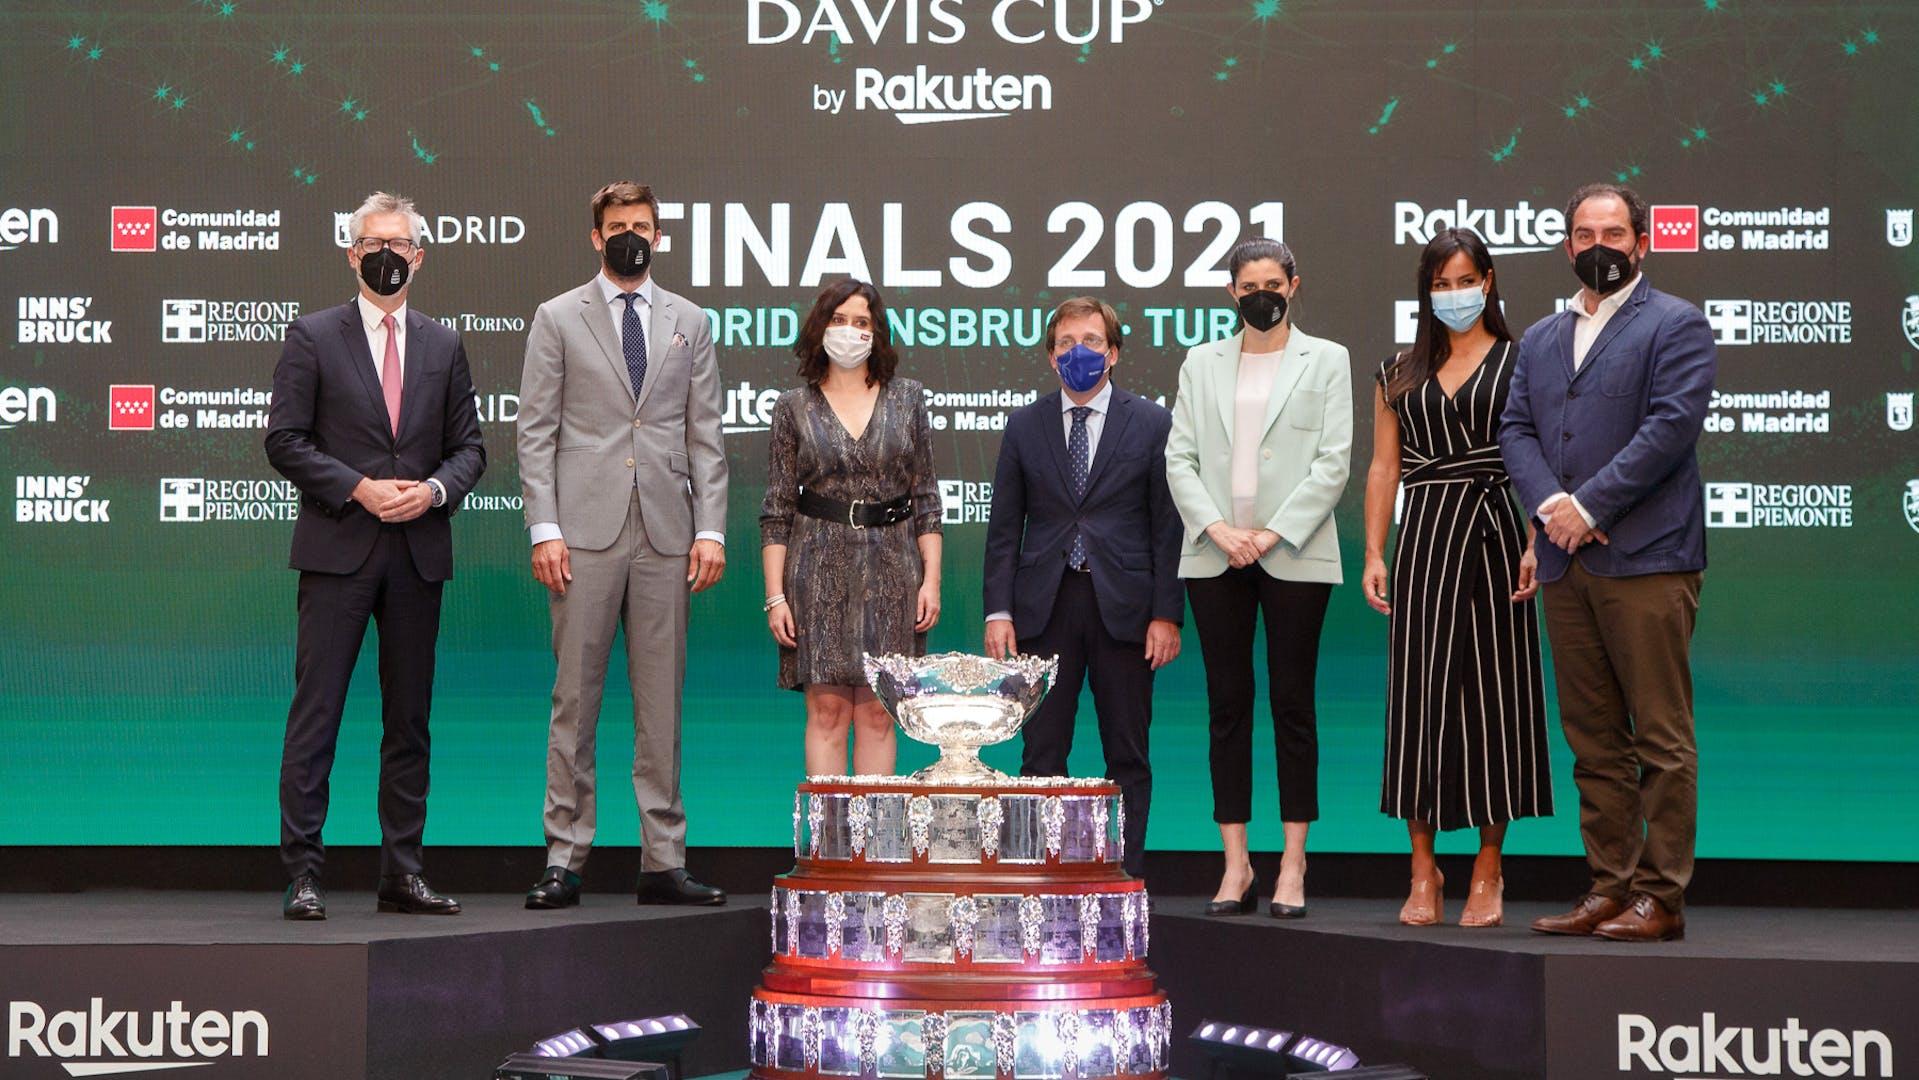 Davis Cup Frankfurt 2021